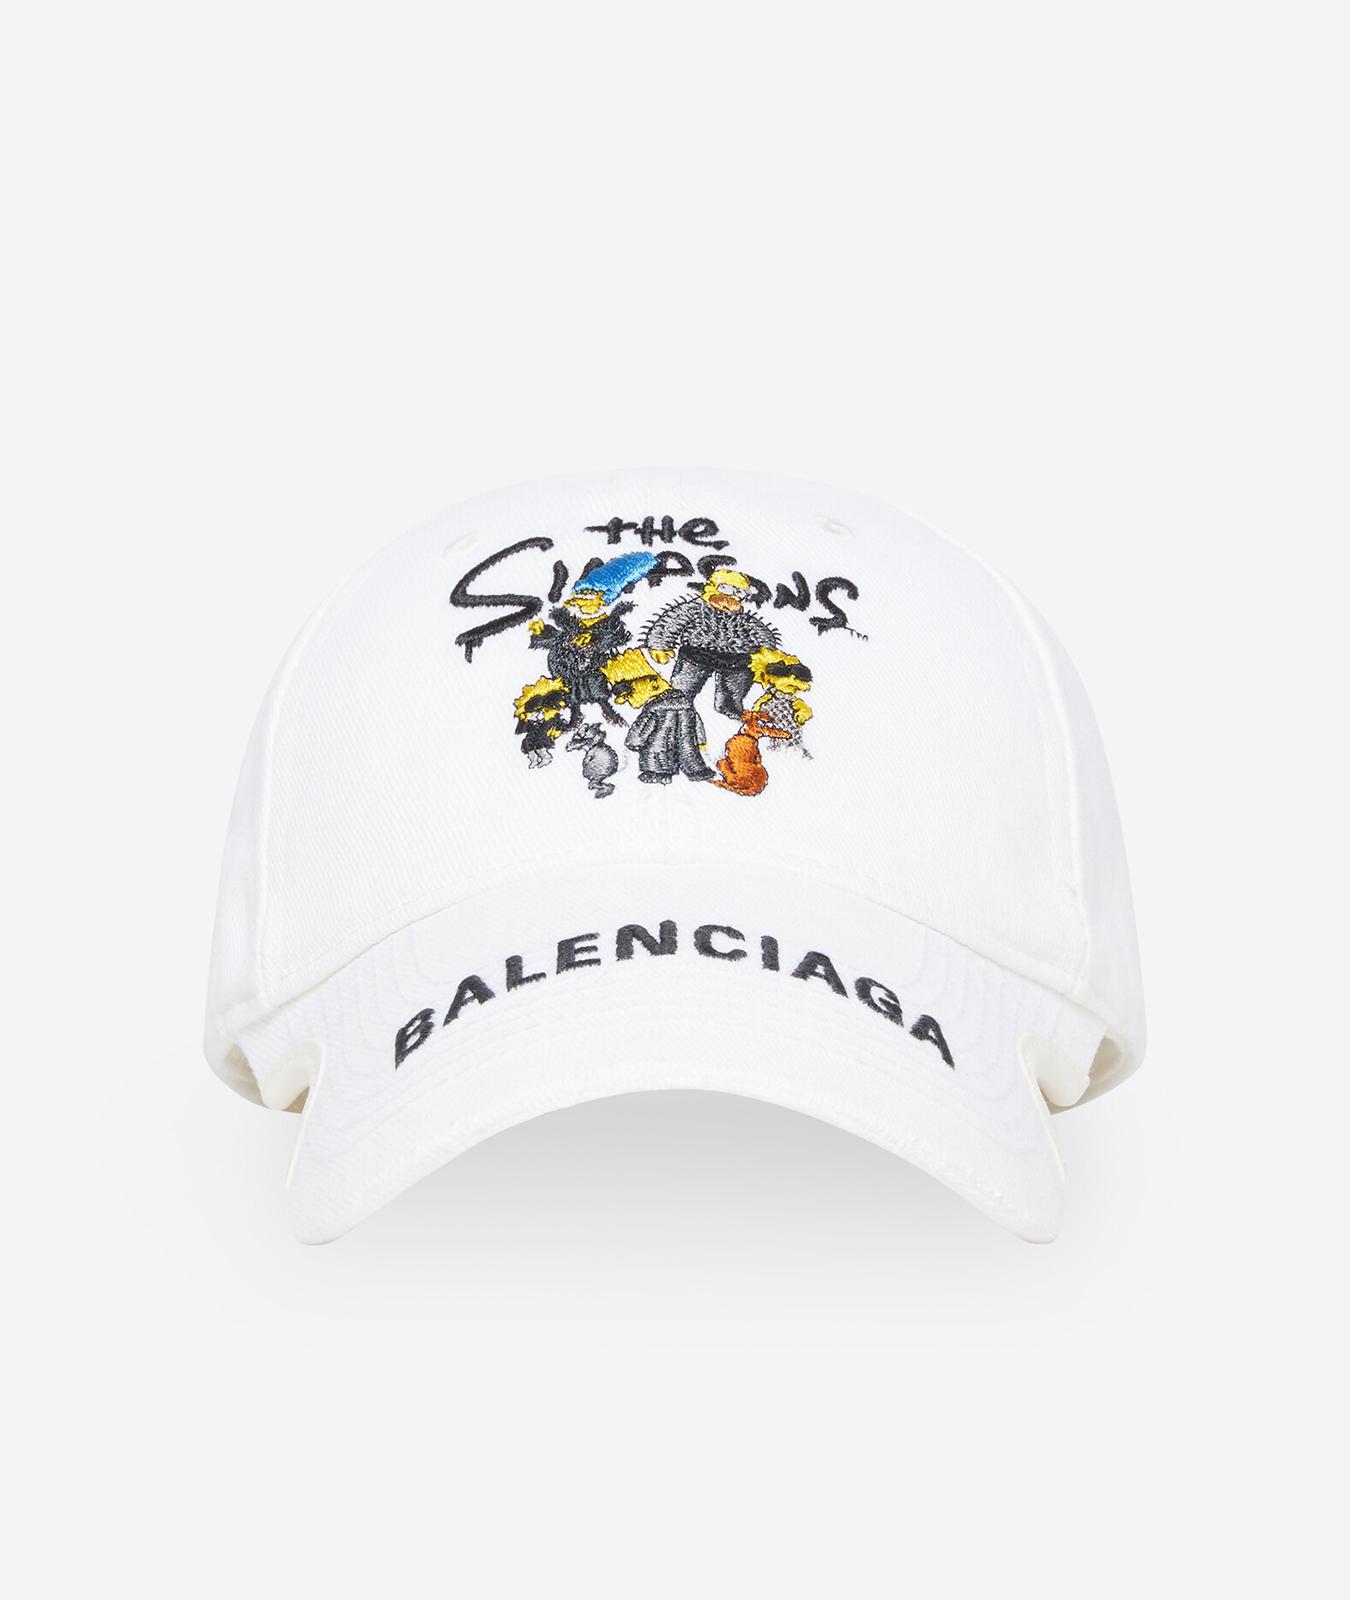 Gorra de Balenciaga x Los Simpson